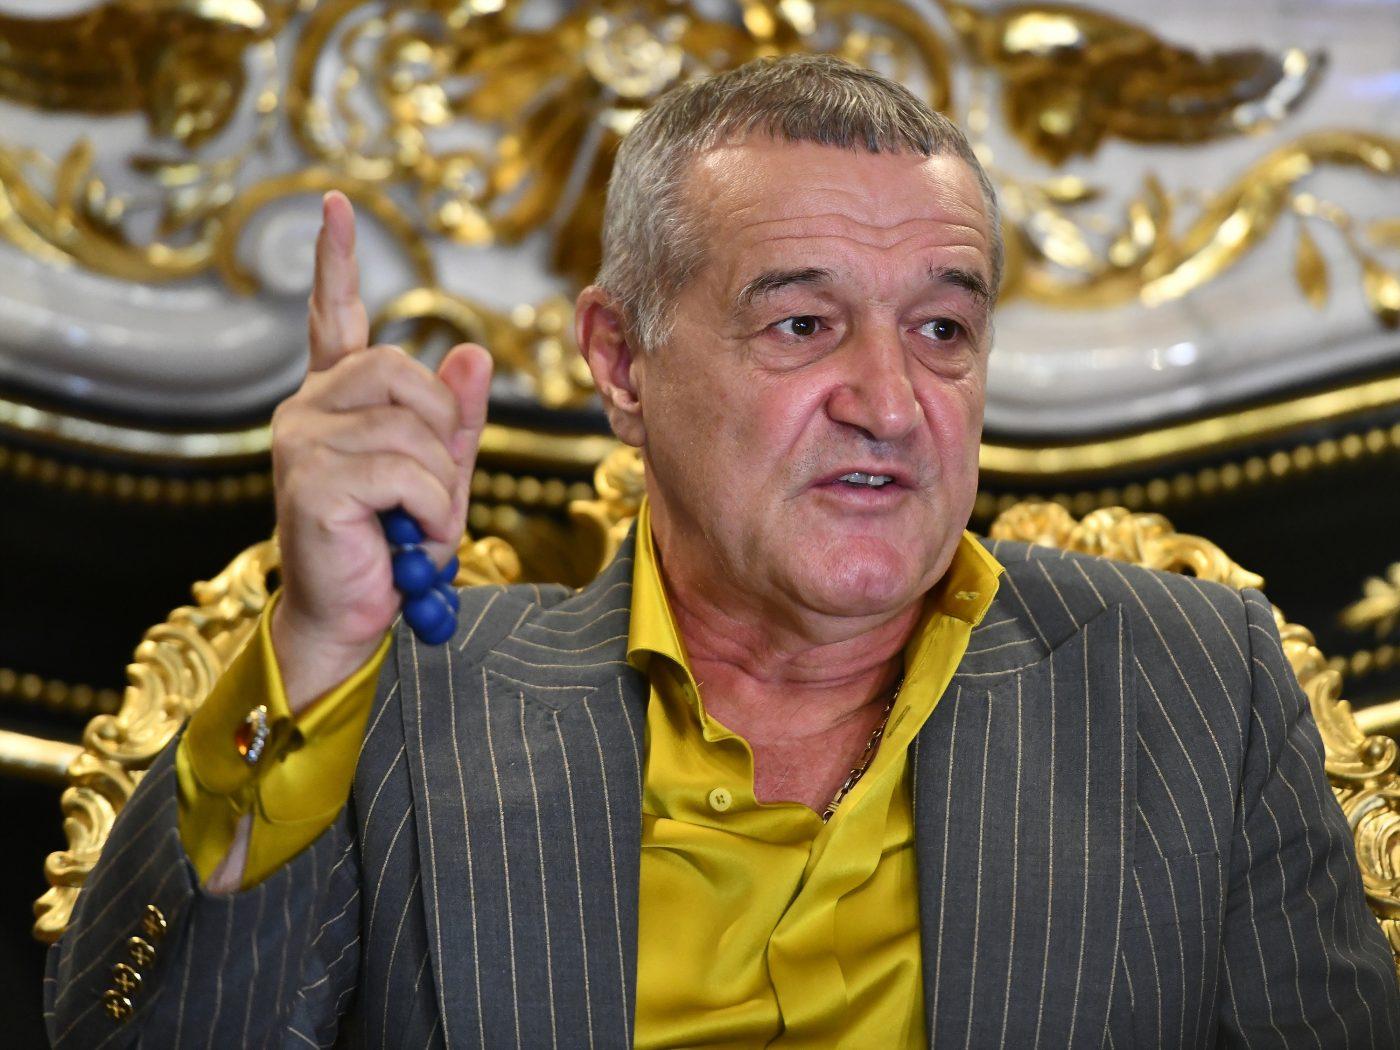 Becali l-a criticat constant pe Buș